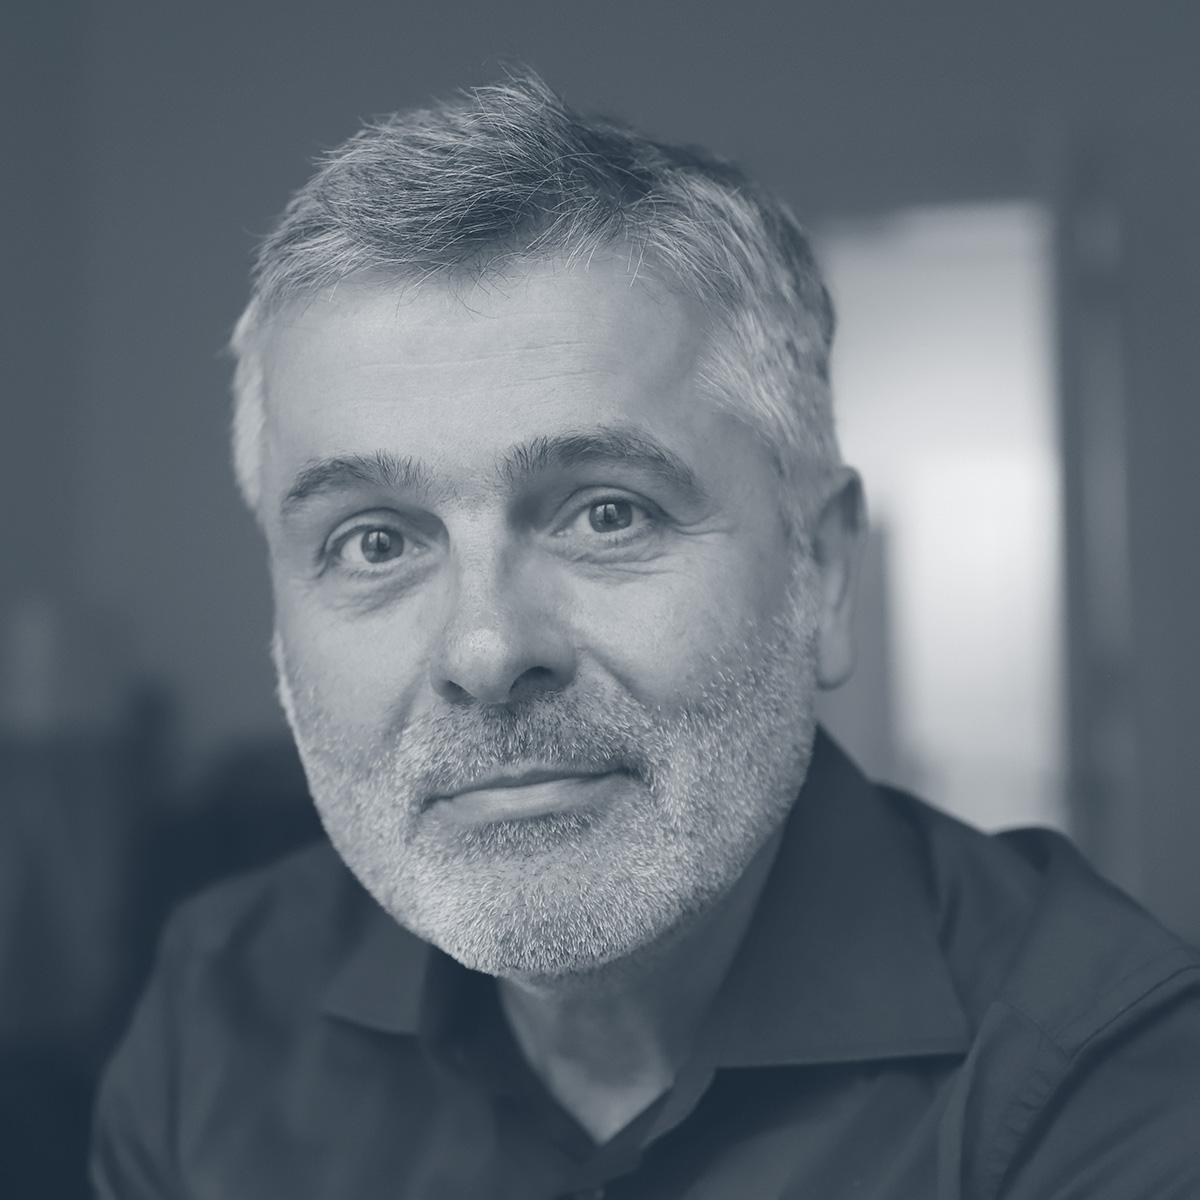 Justus Oehler